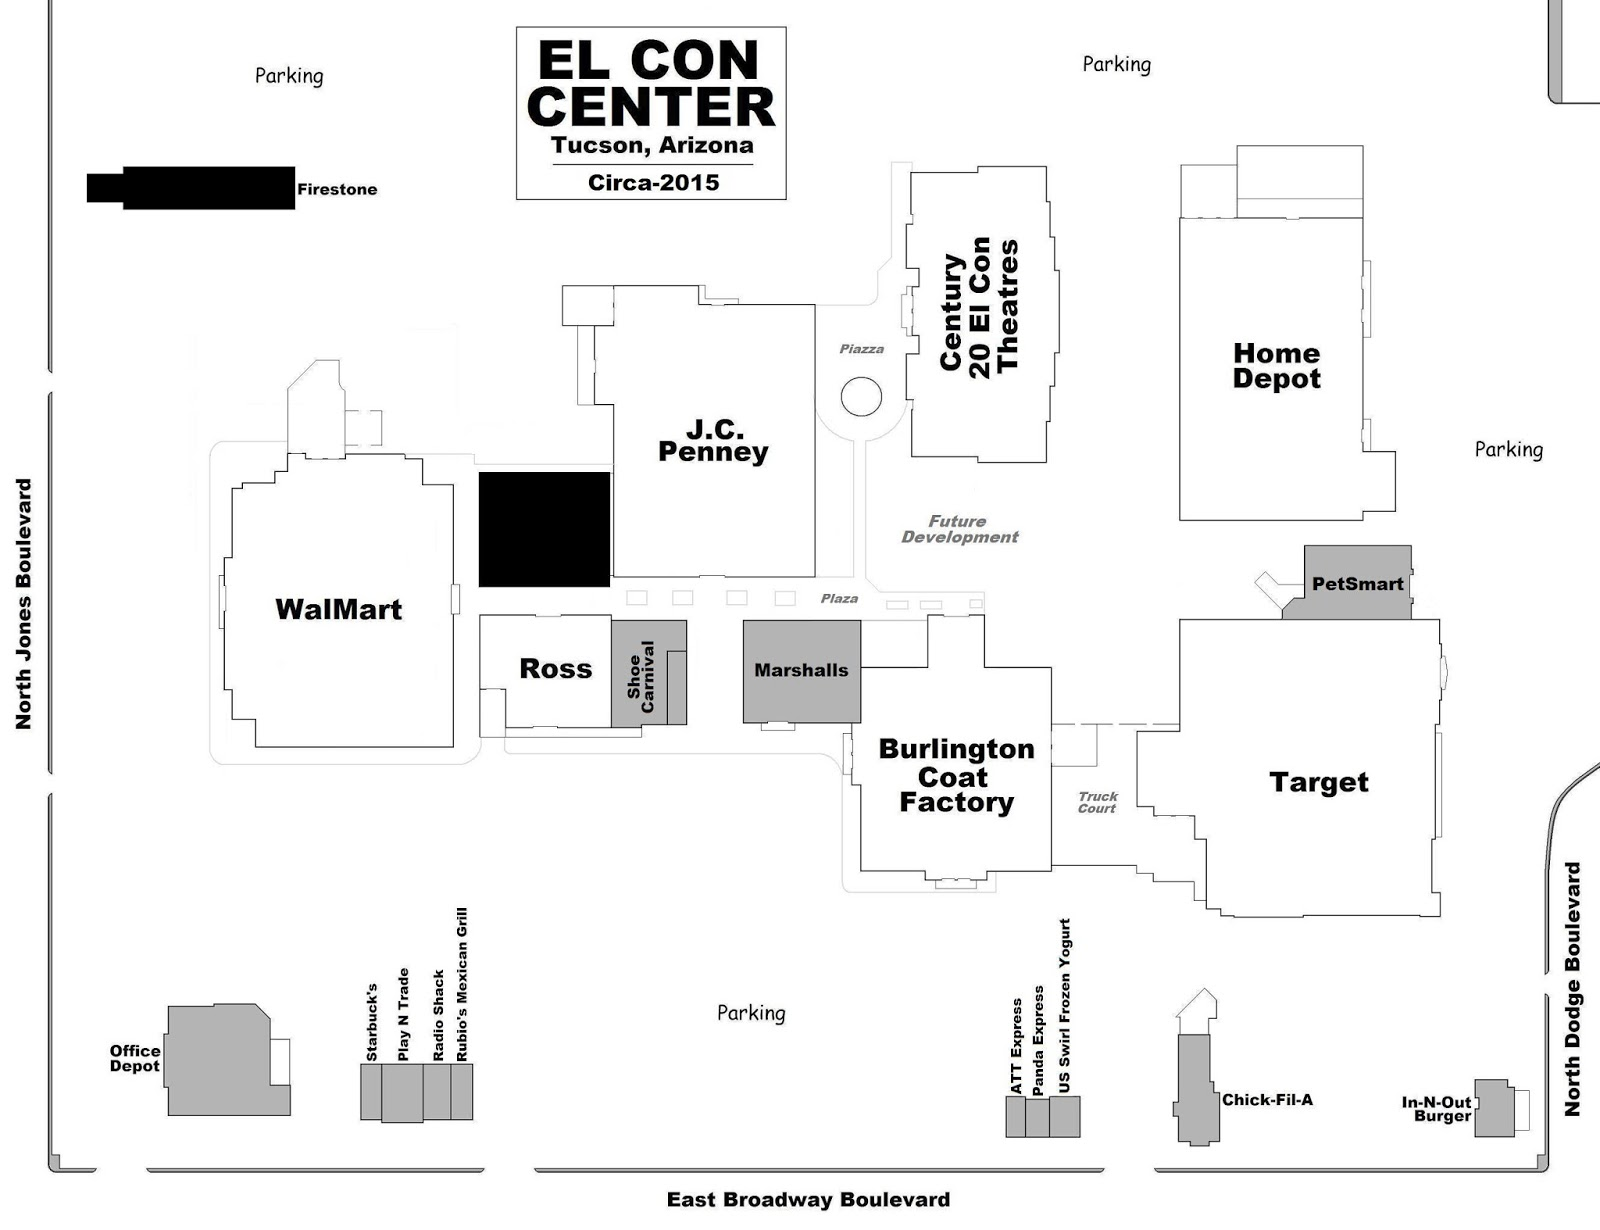 Home depot in tucson az on broadway - 14_el Con Mall Plan 2015 Jpg